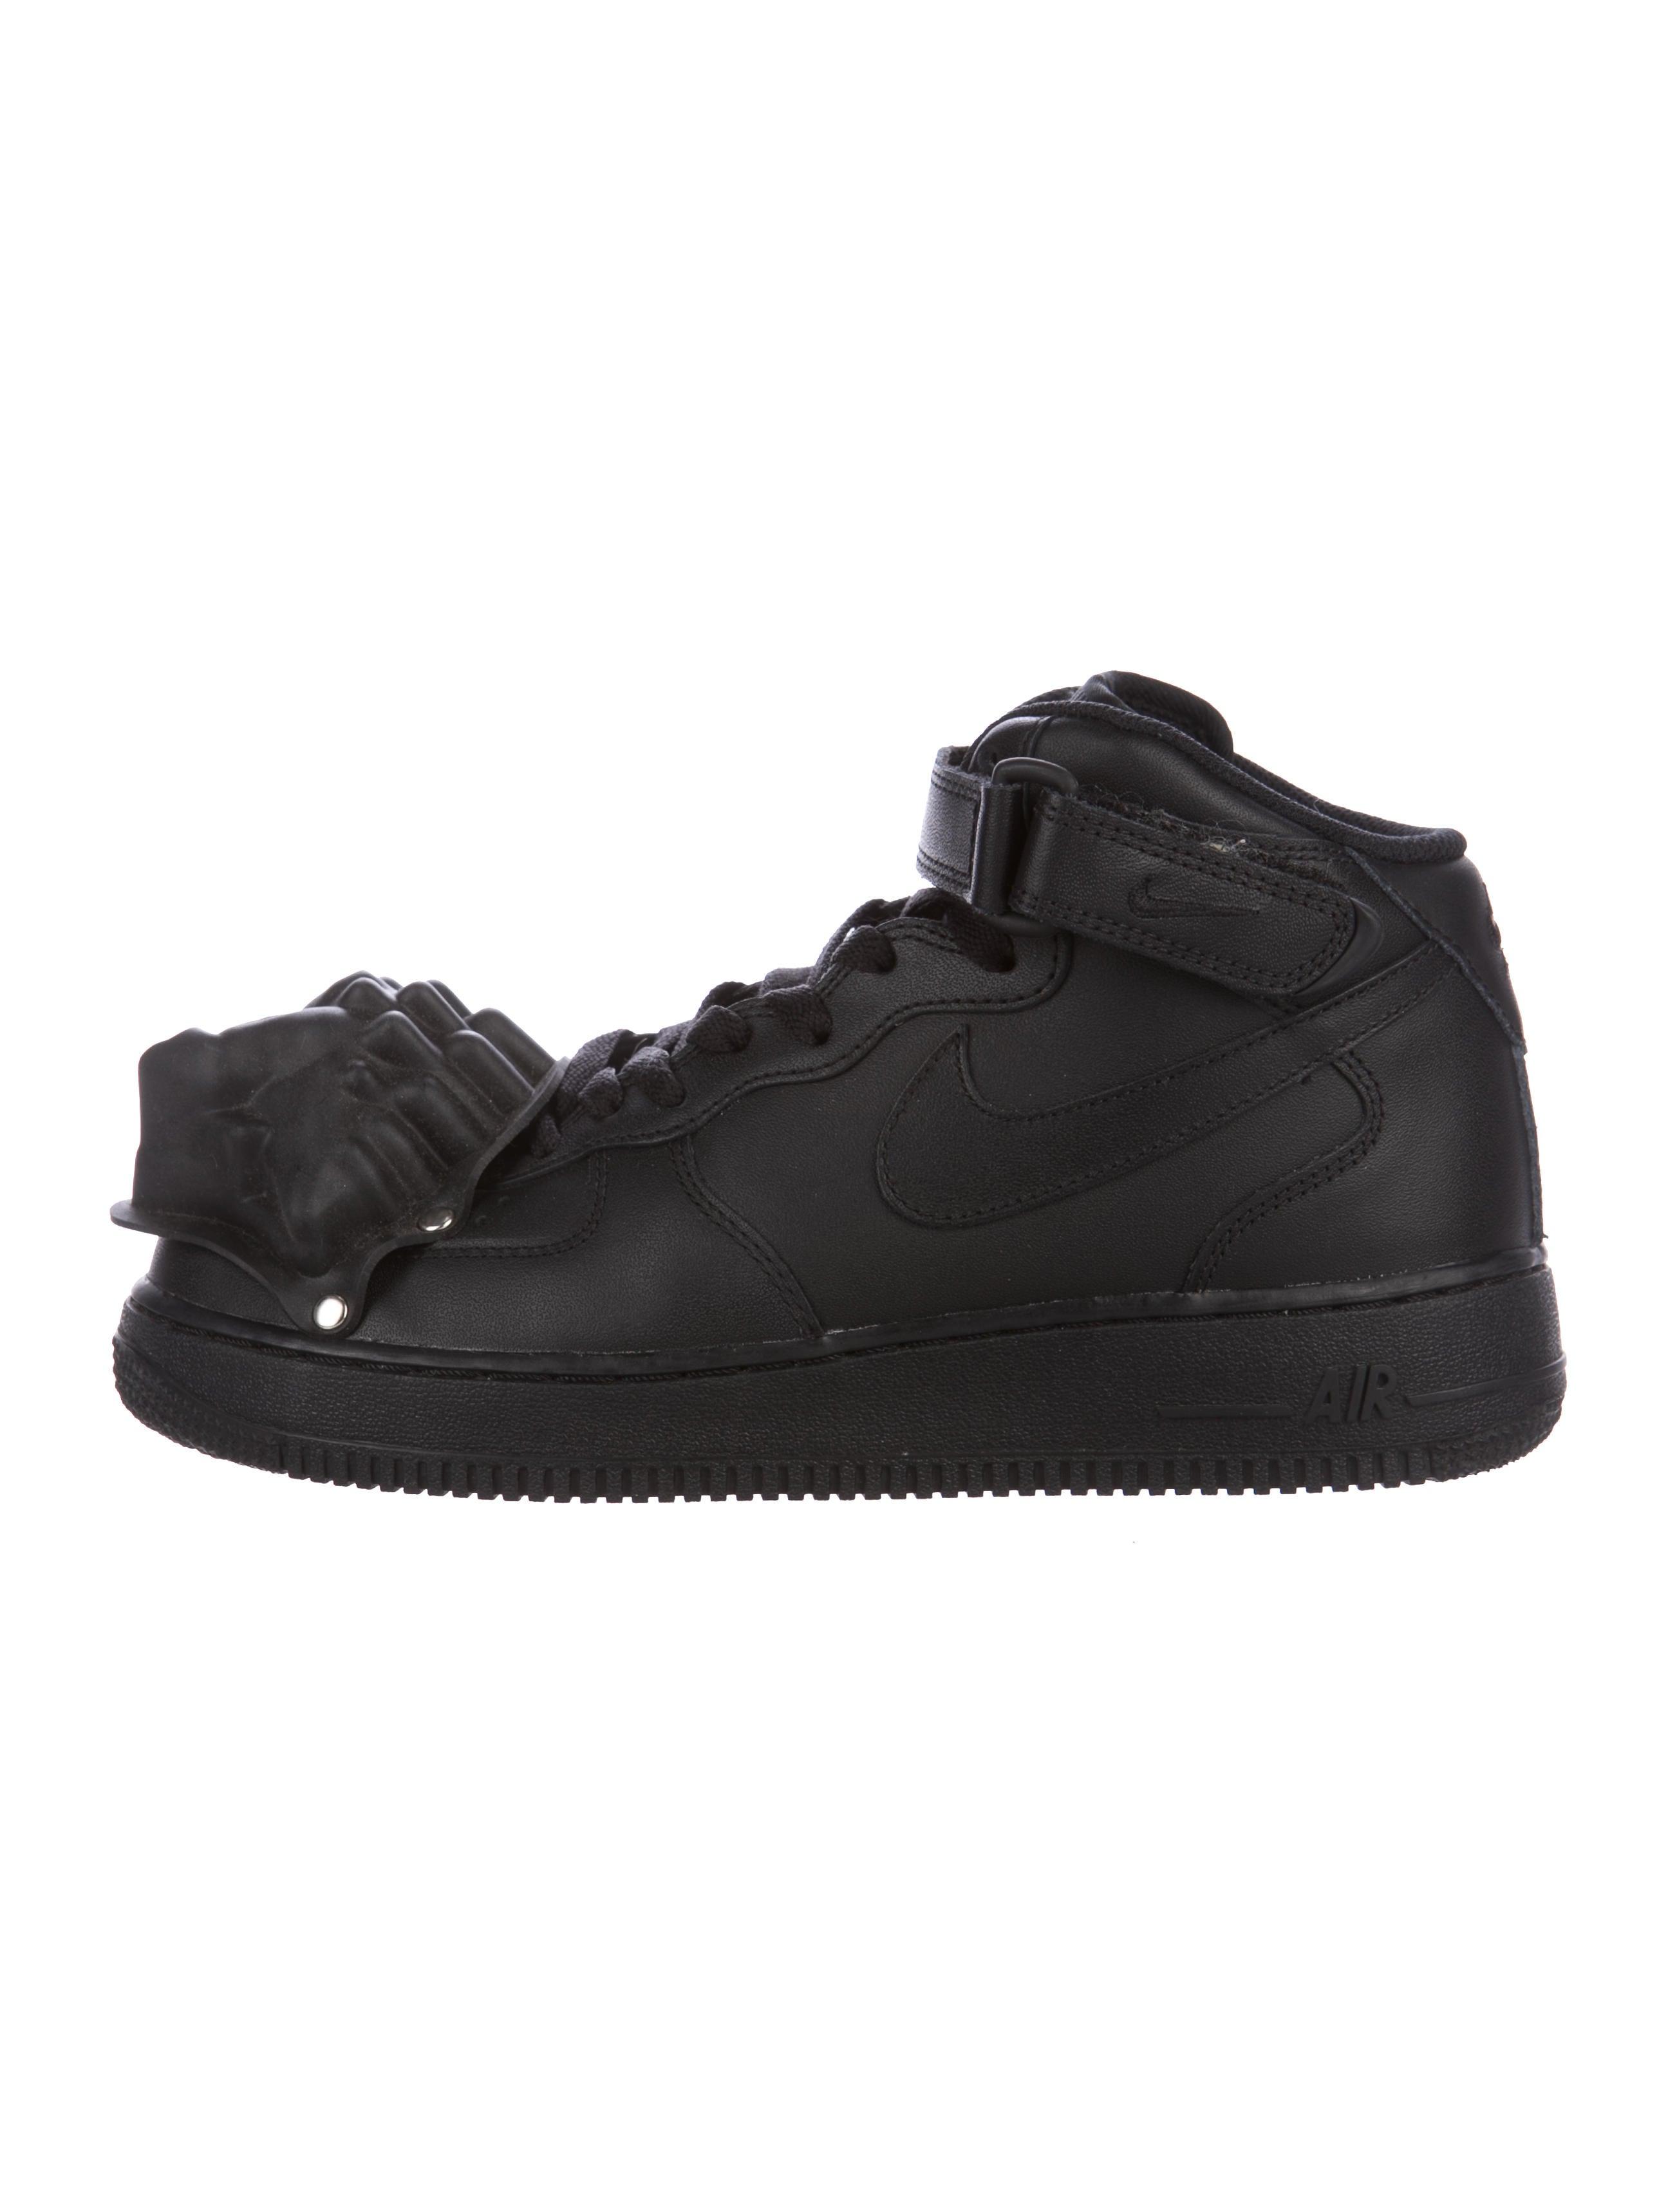 Comme des Garçons x Nike Air Force 1 Custom Sneakers Shoes